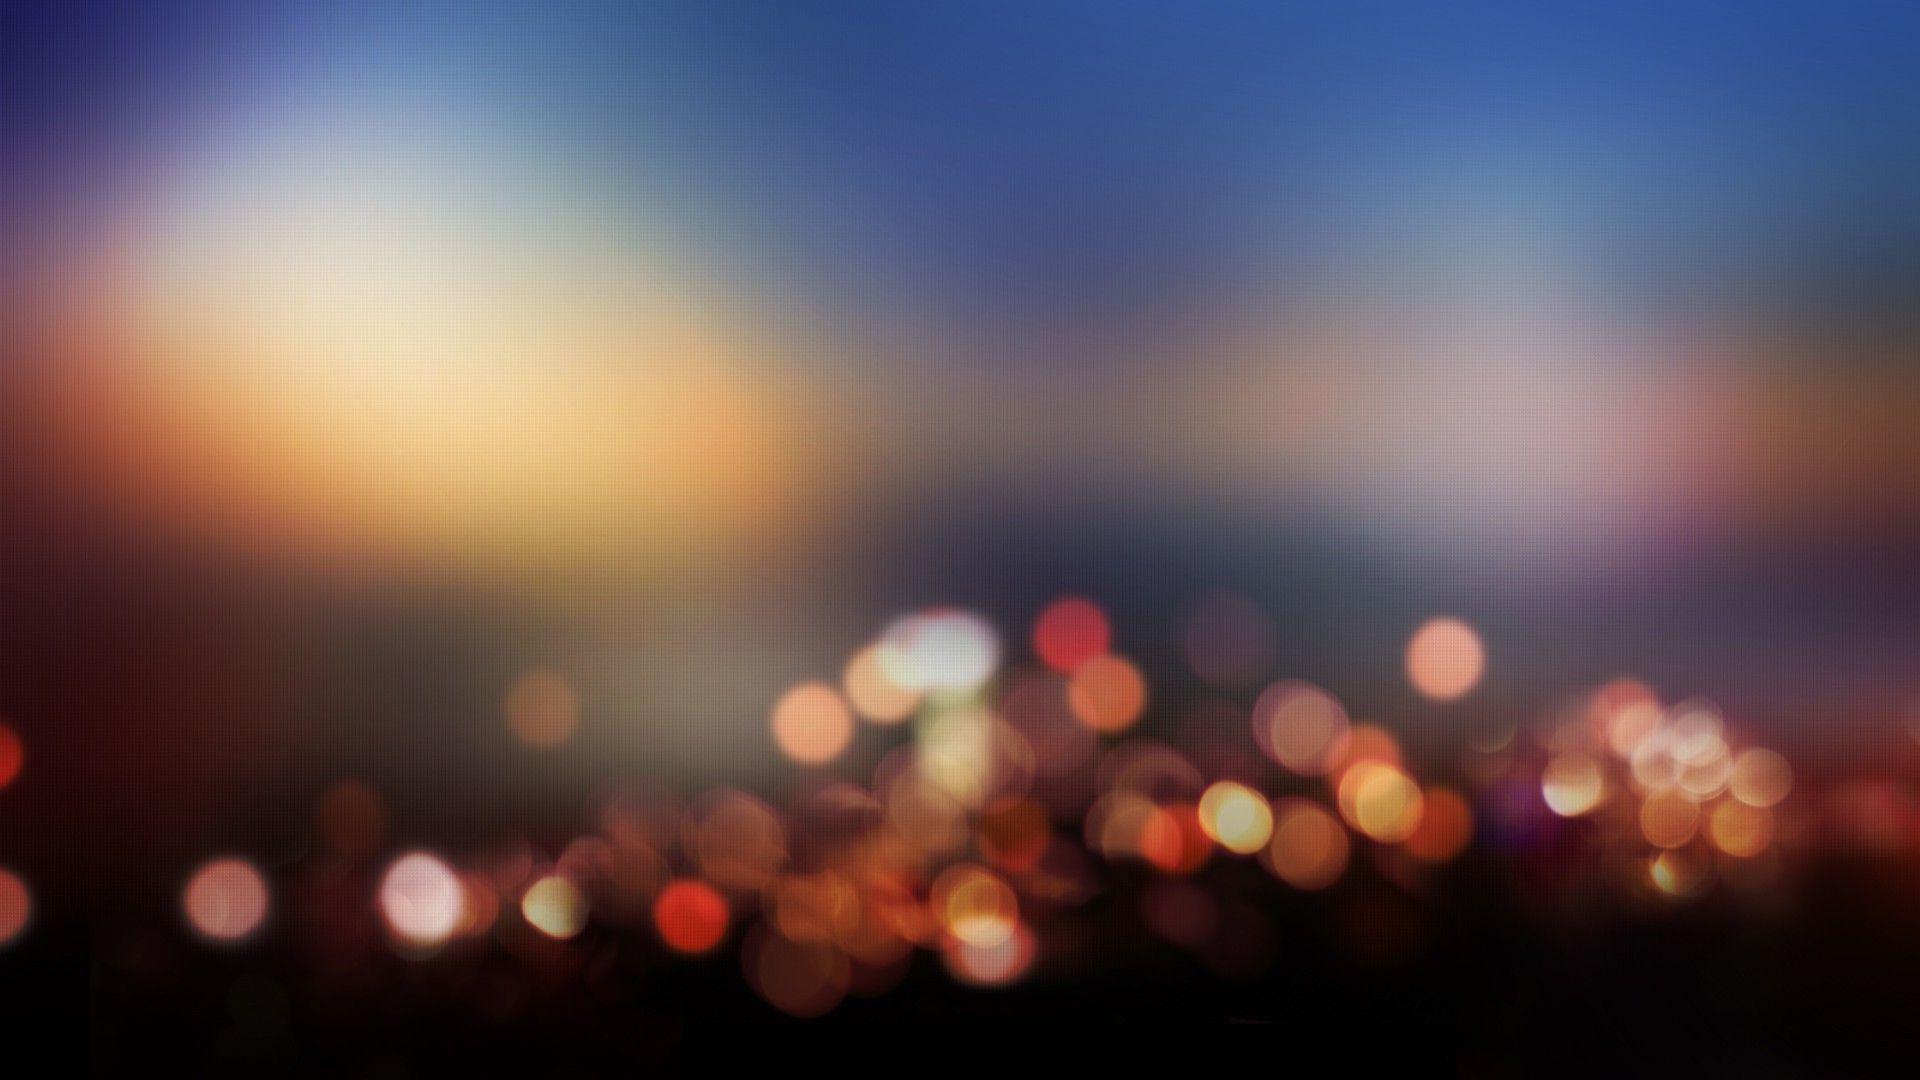 Blurred City Lights Wallpaper City Lights Wallpaper Android Wallpaper City Wallpaper Hd wallpaper lights blur city glare